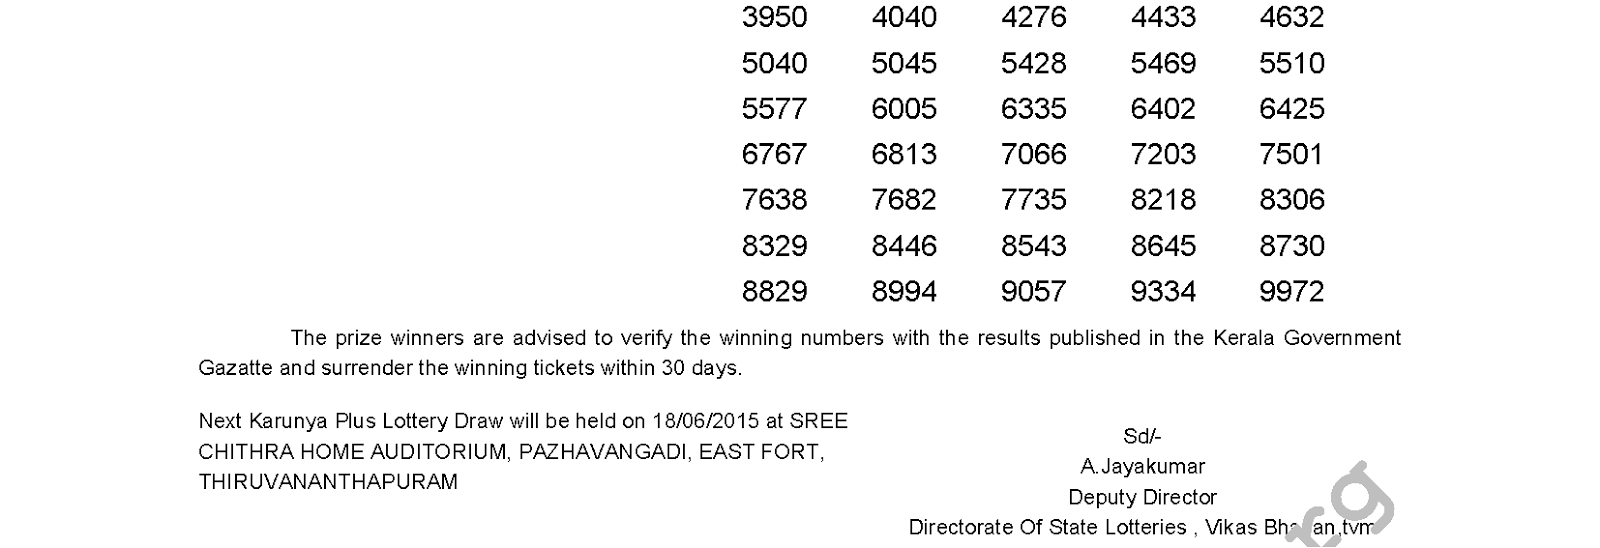 Karunya Plus Lottery KN 61 Result 11-6-2015